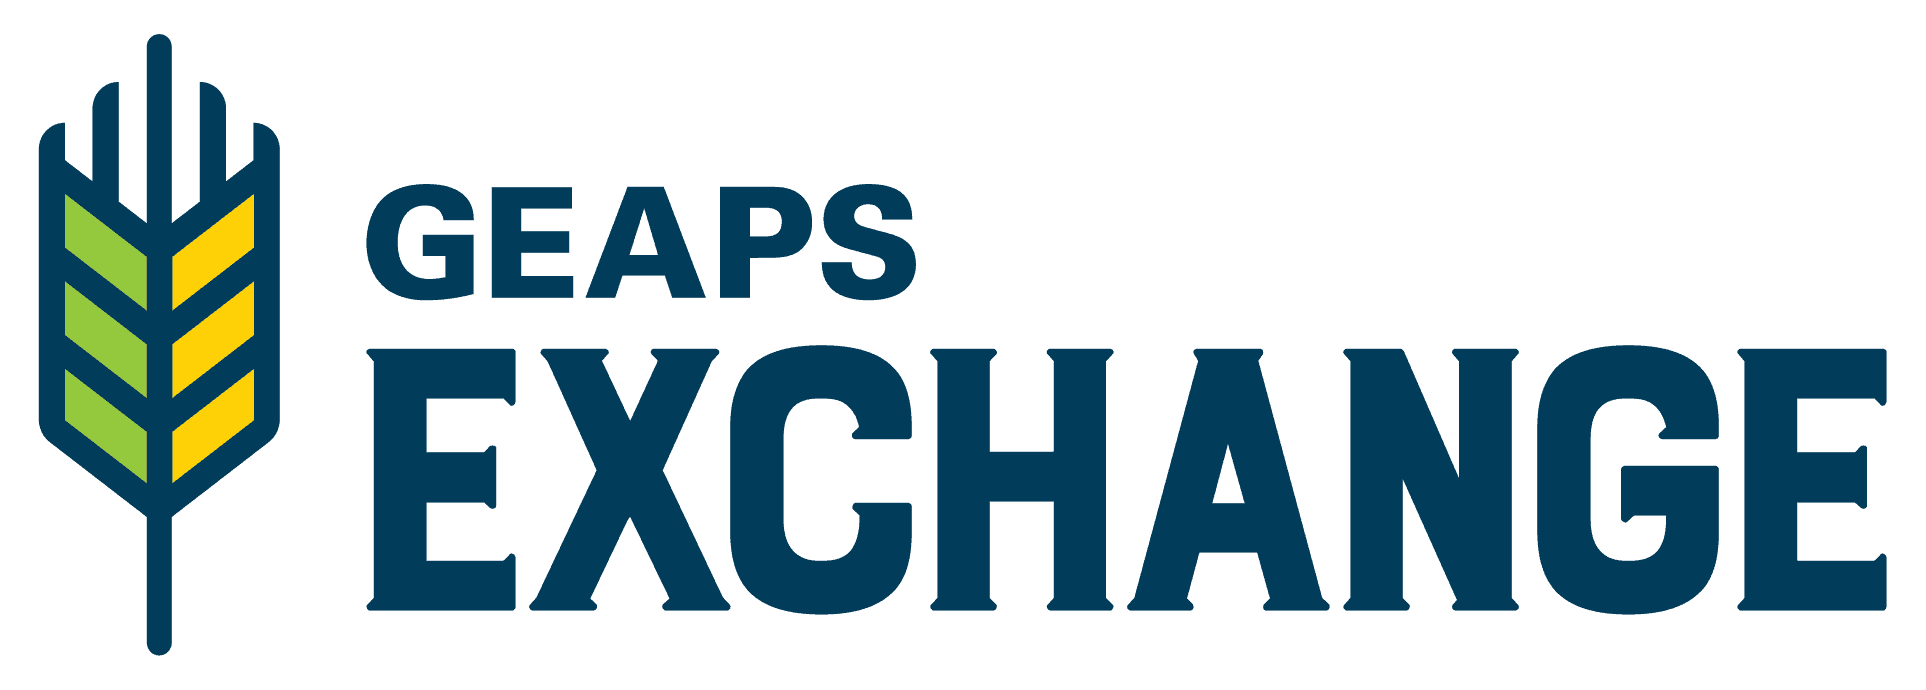 GEAPS exchange 2021